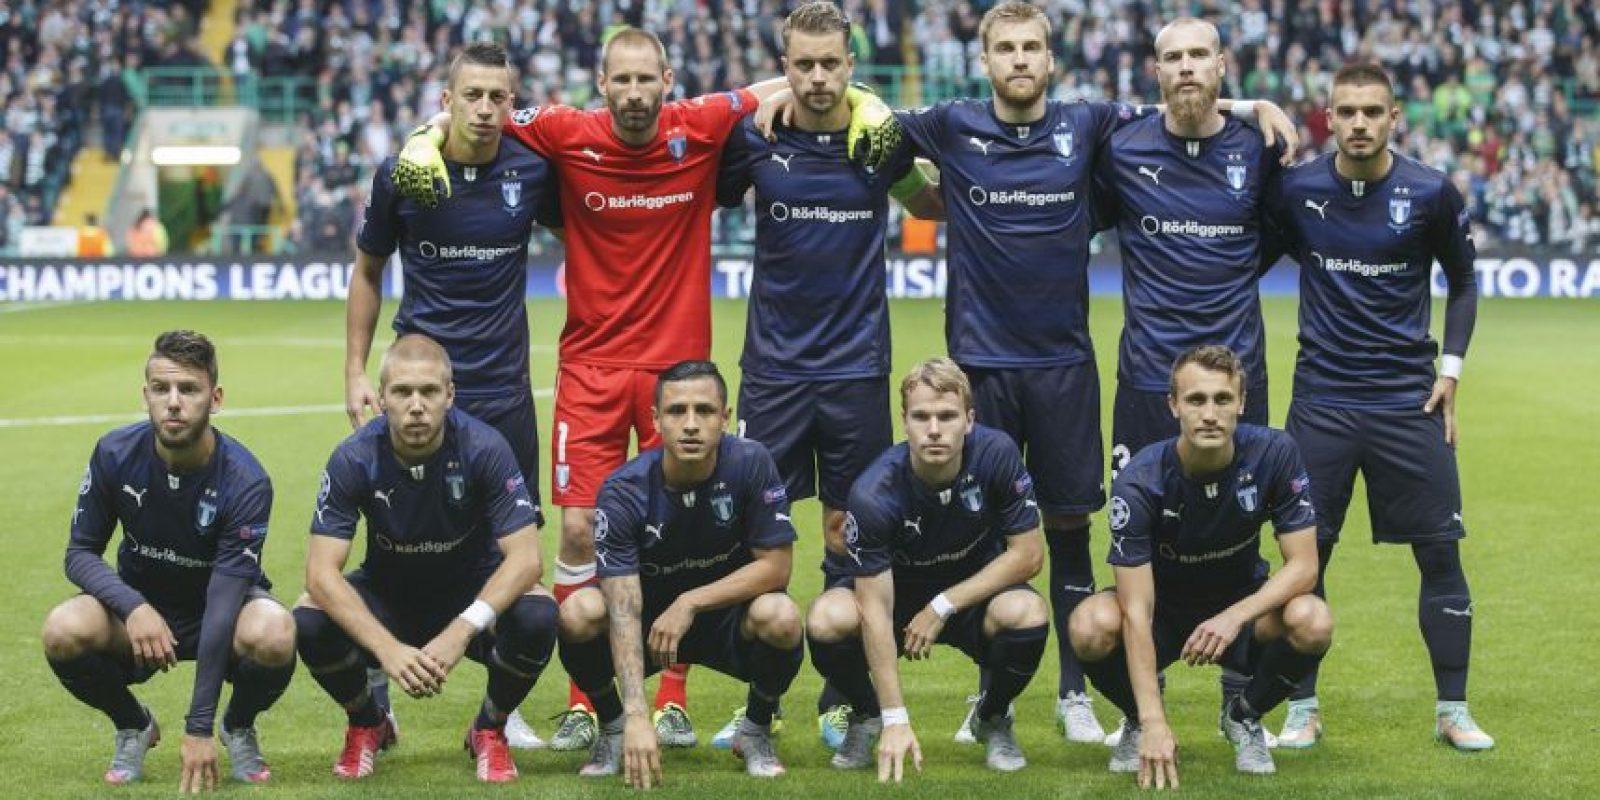 3. Malmo FF (Suecia) / 20.8 millones de euros. Foto:Getty Images